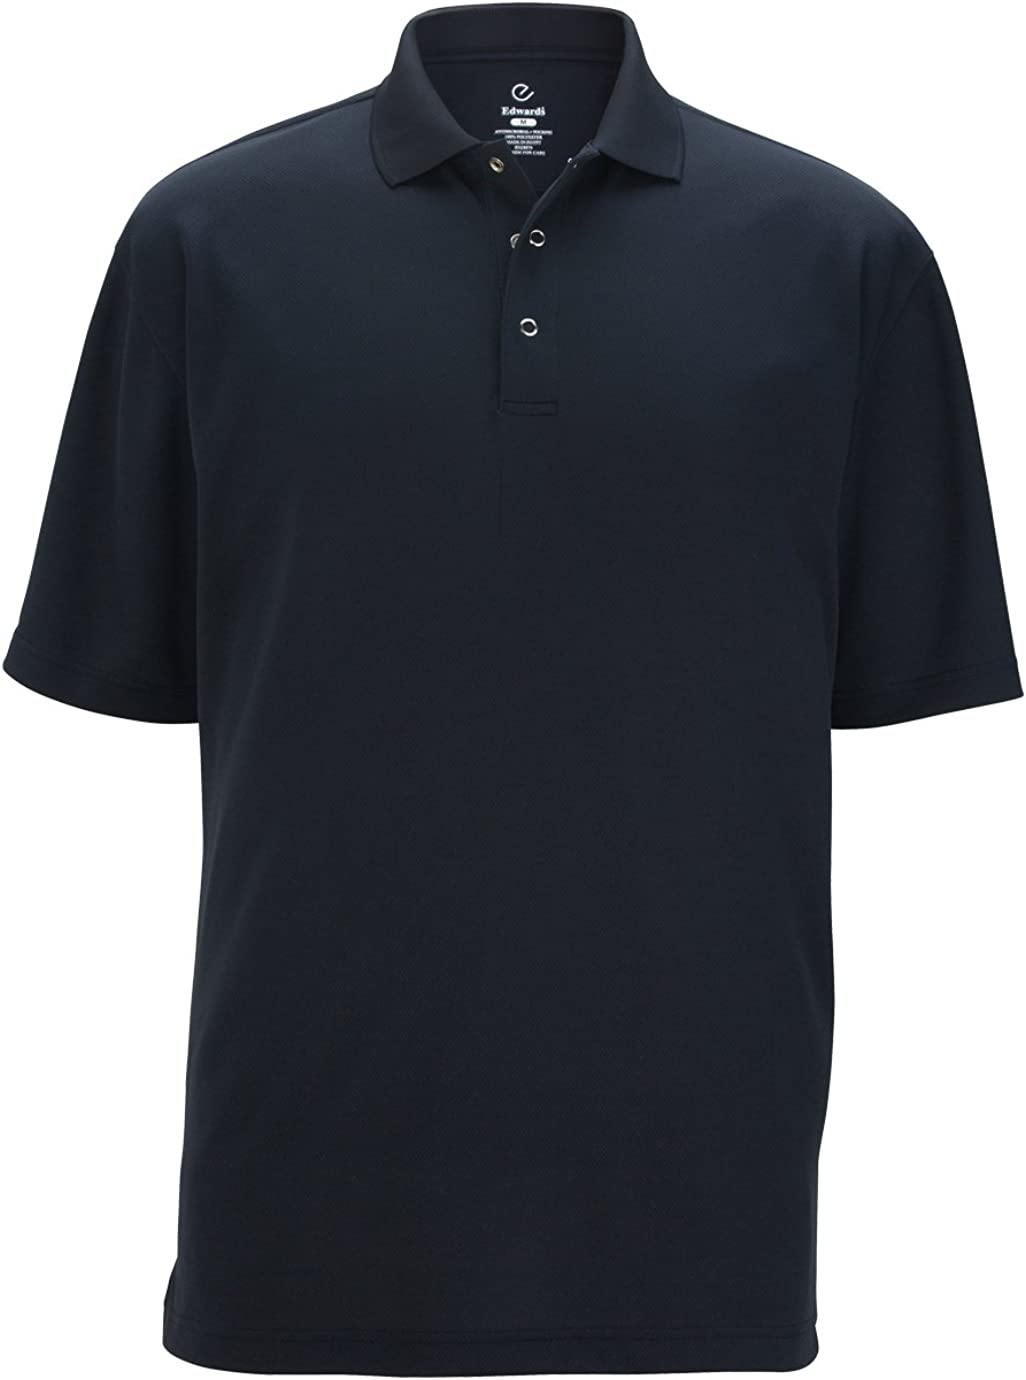 Ed Garments Men's Snap Front Short Sleeve Polo